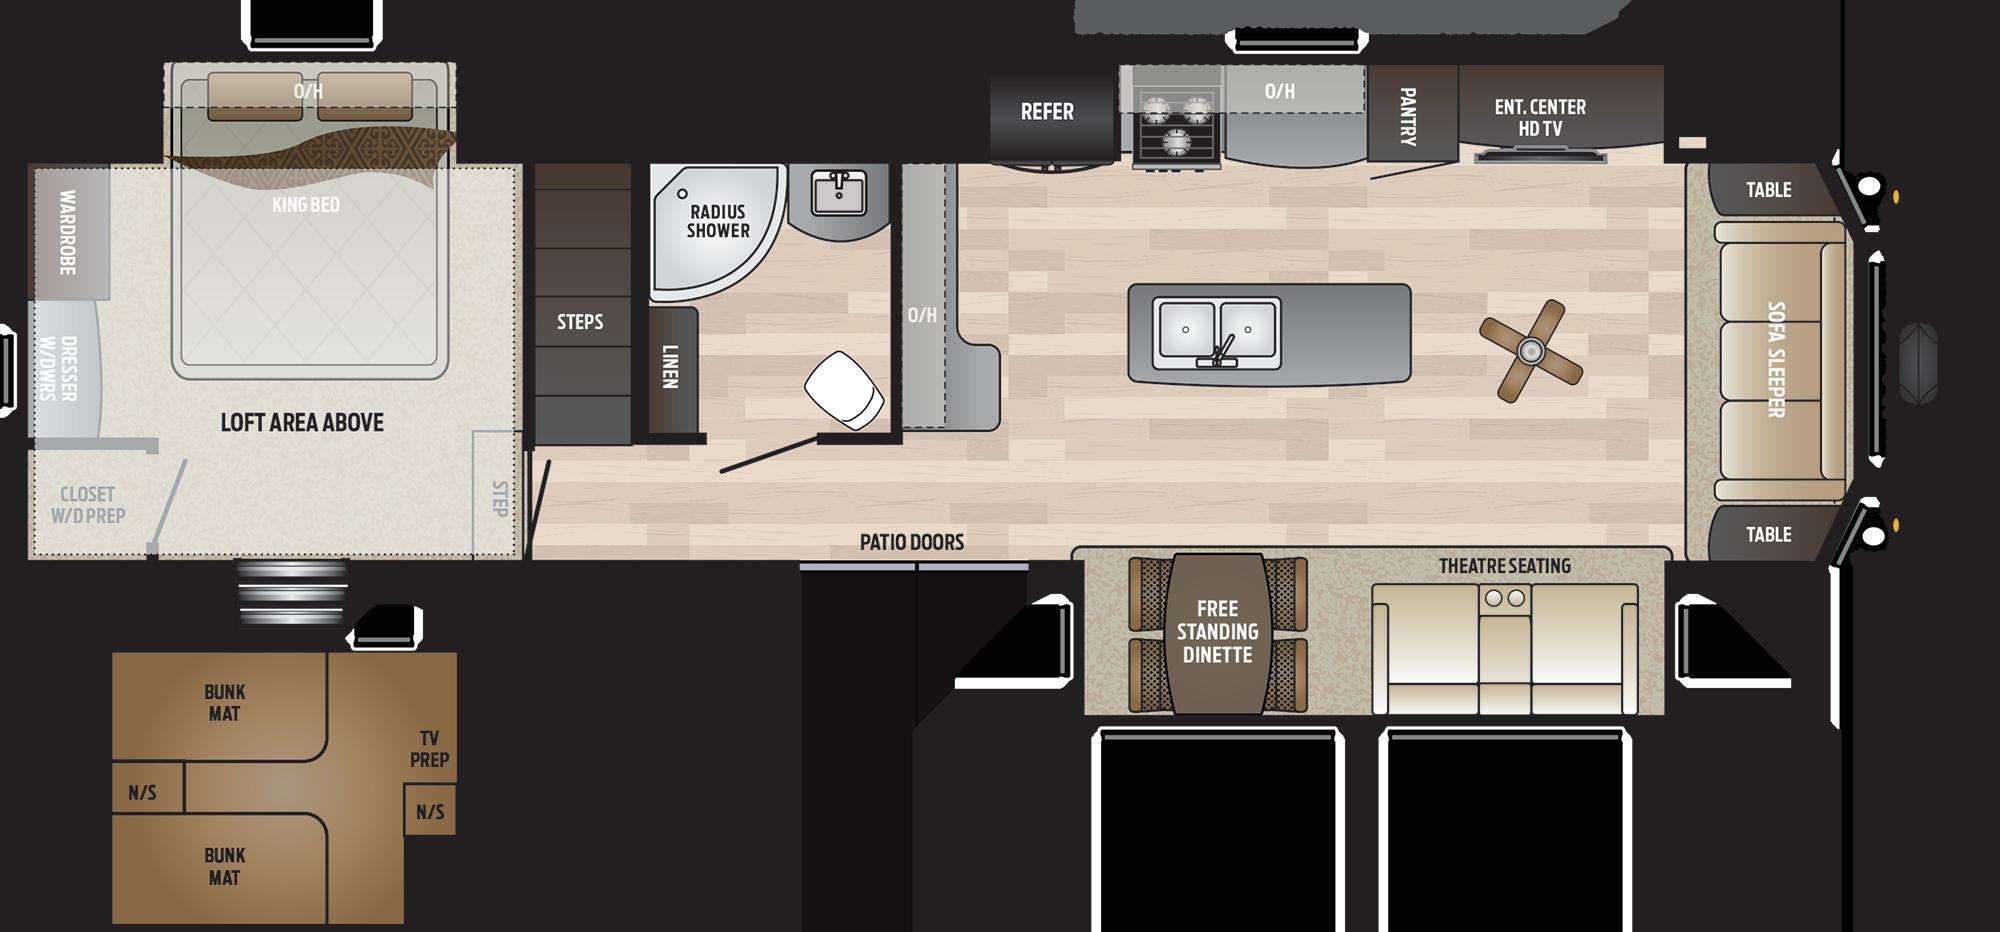 2020 KEYSTONE RETREAT 39LOFT (bunks) Floorplan